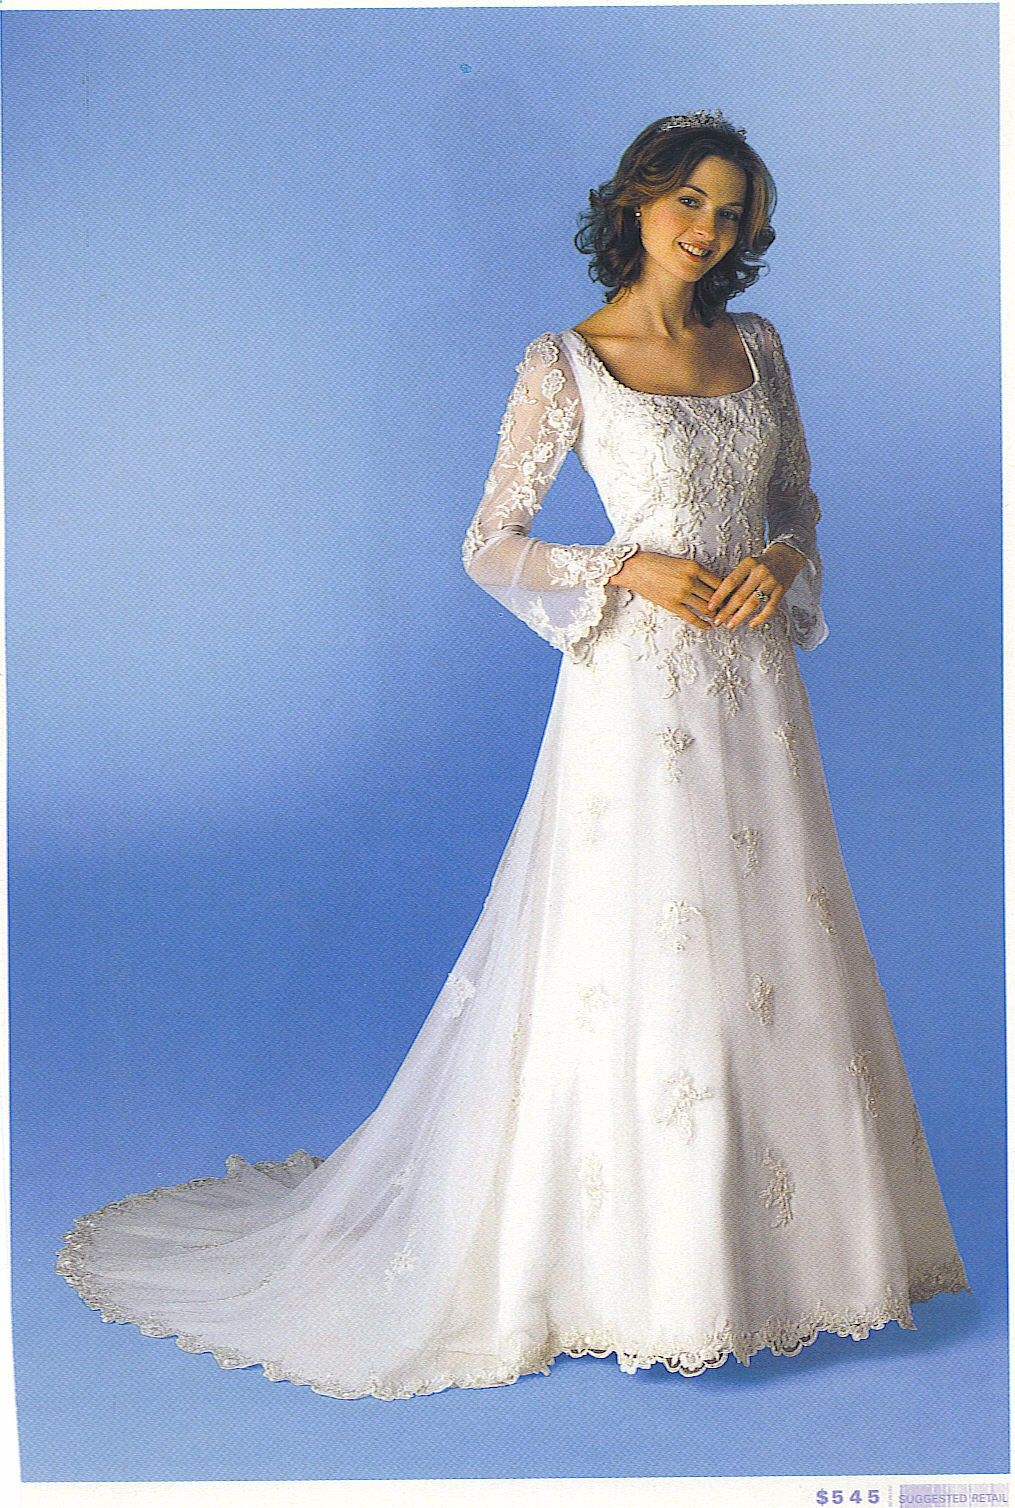 18th century wedding dress  Pin by Chioma on wedding dress  Pinterest